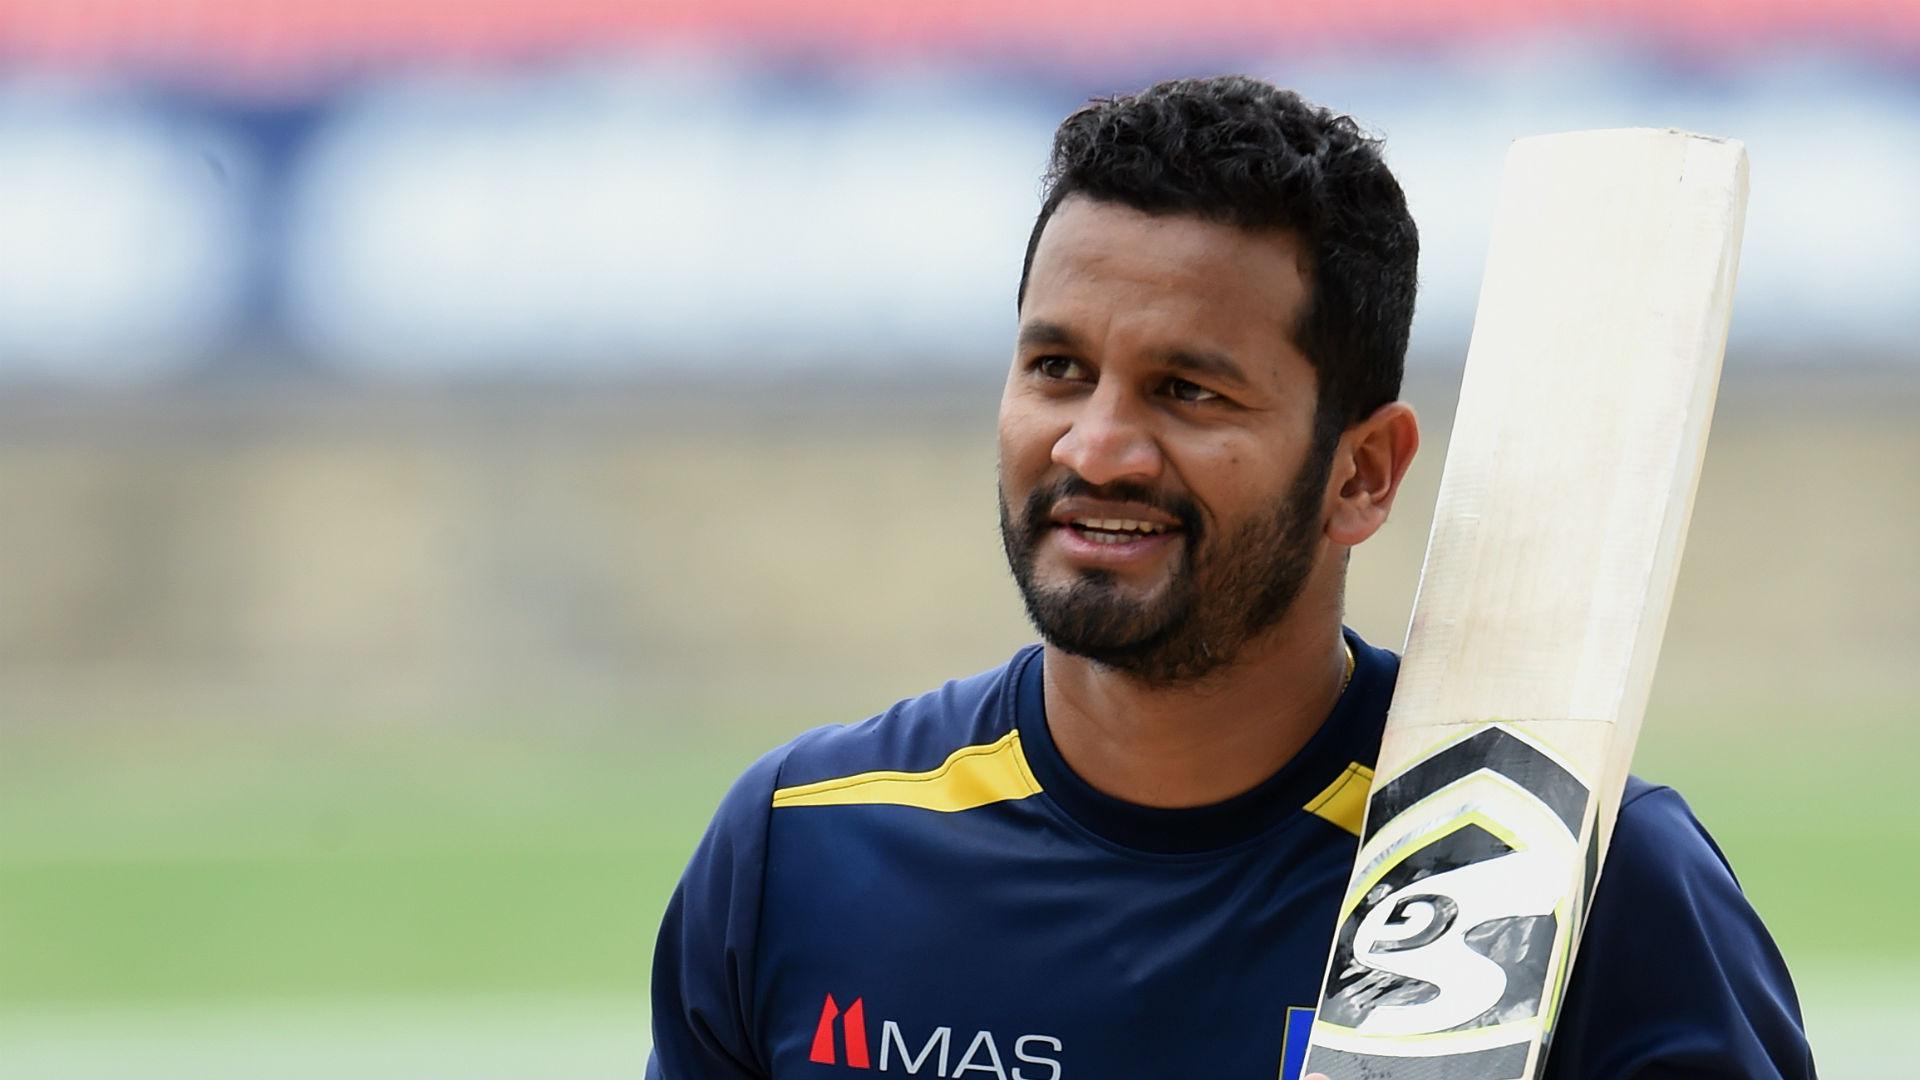 Karunaratne named Sri Lanka captain for World Cup